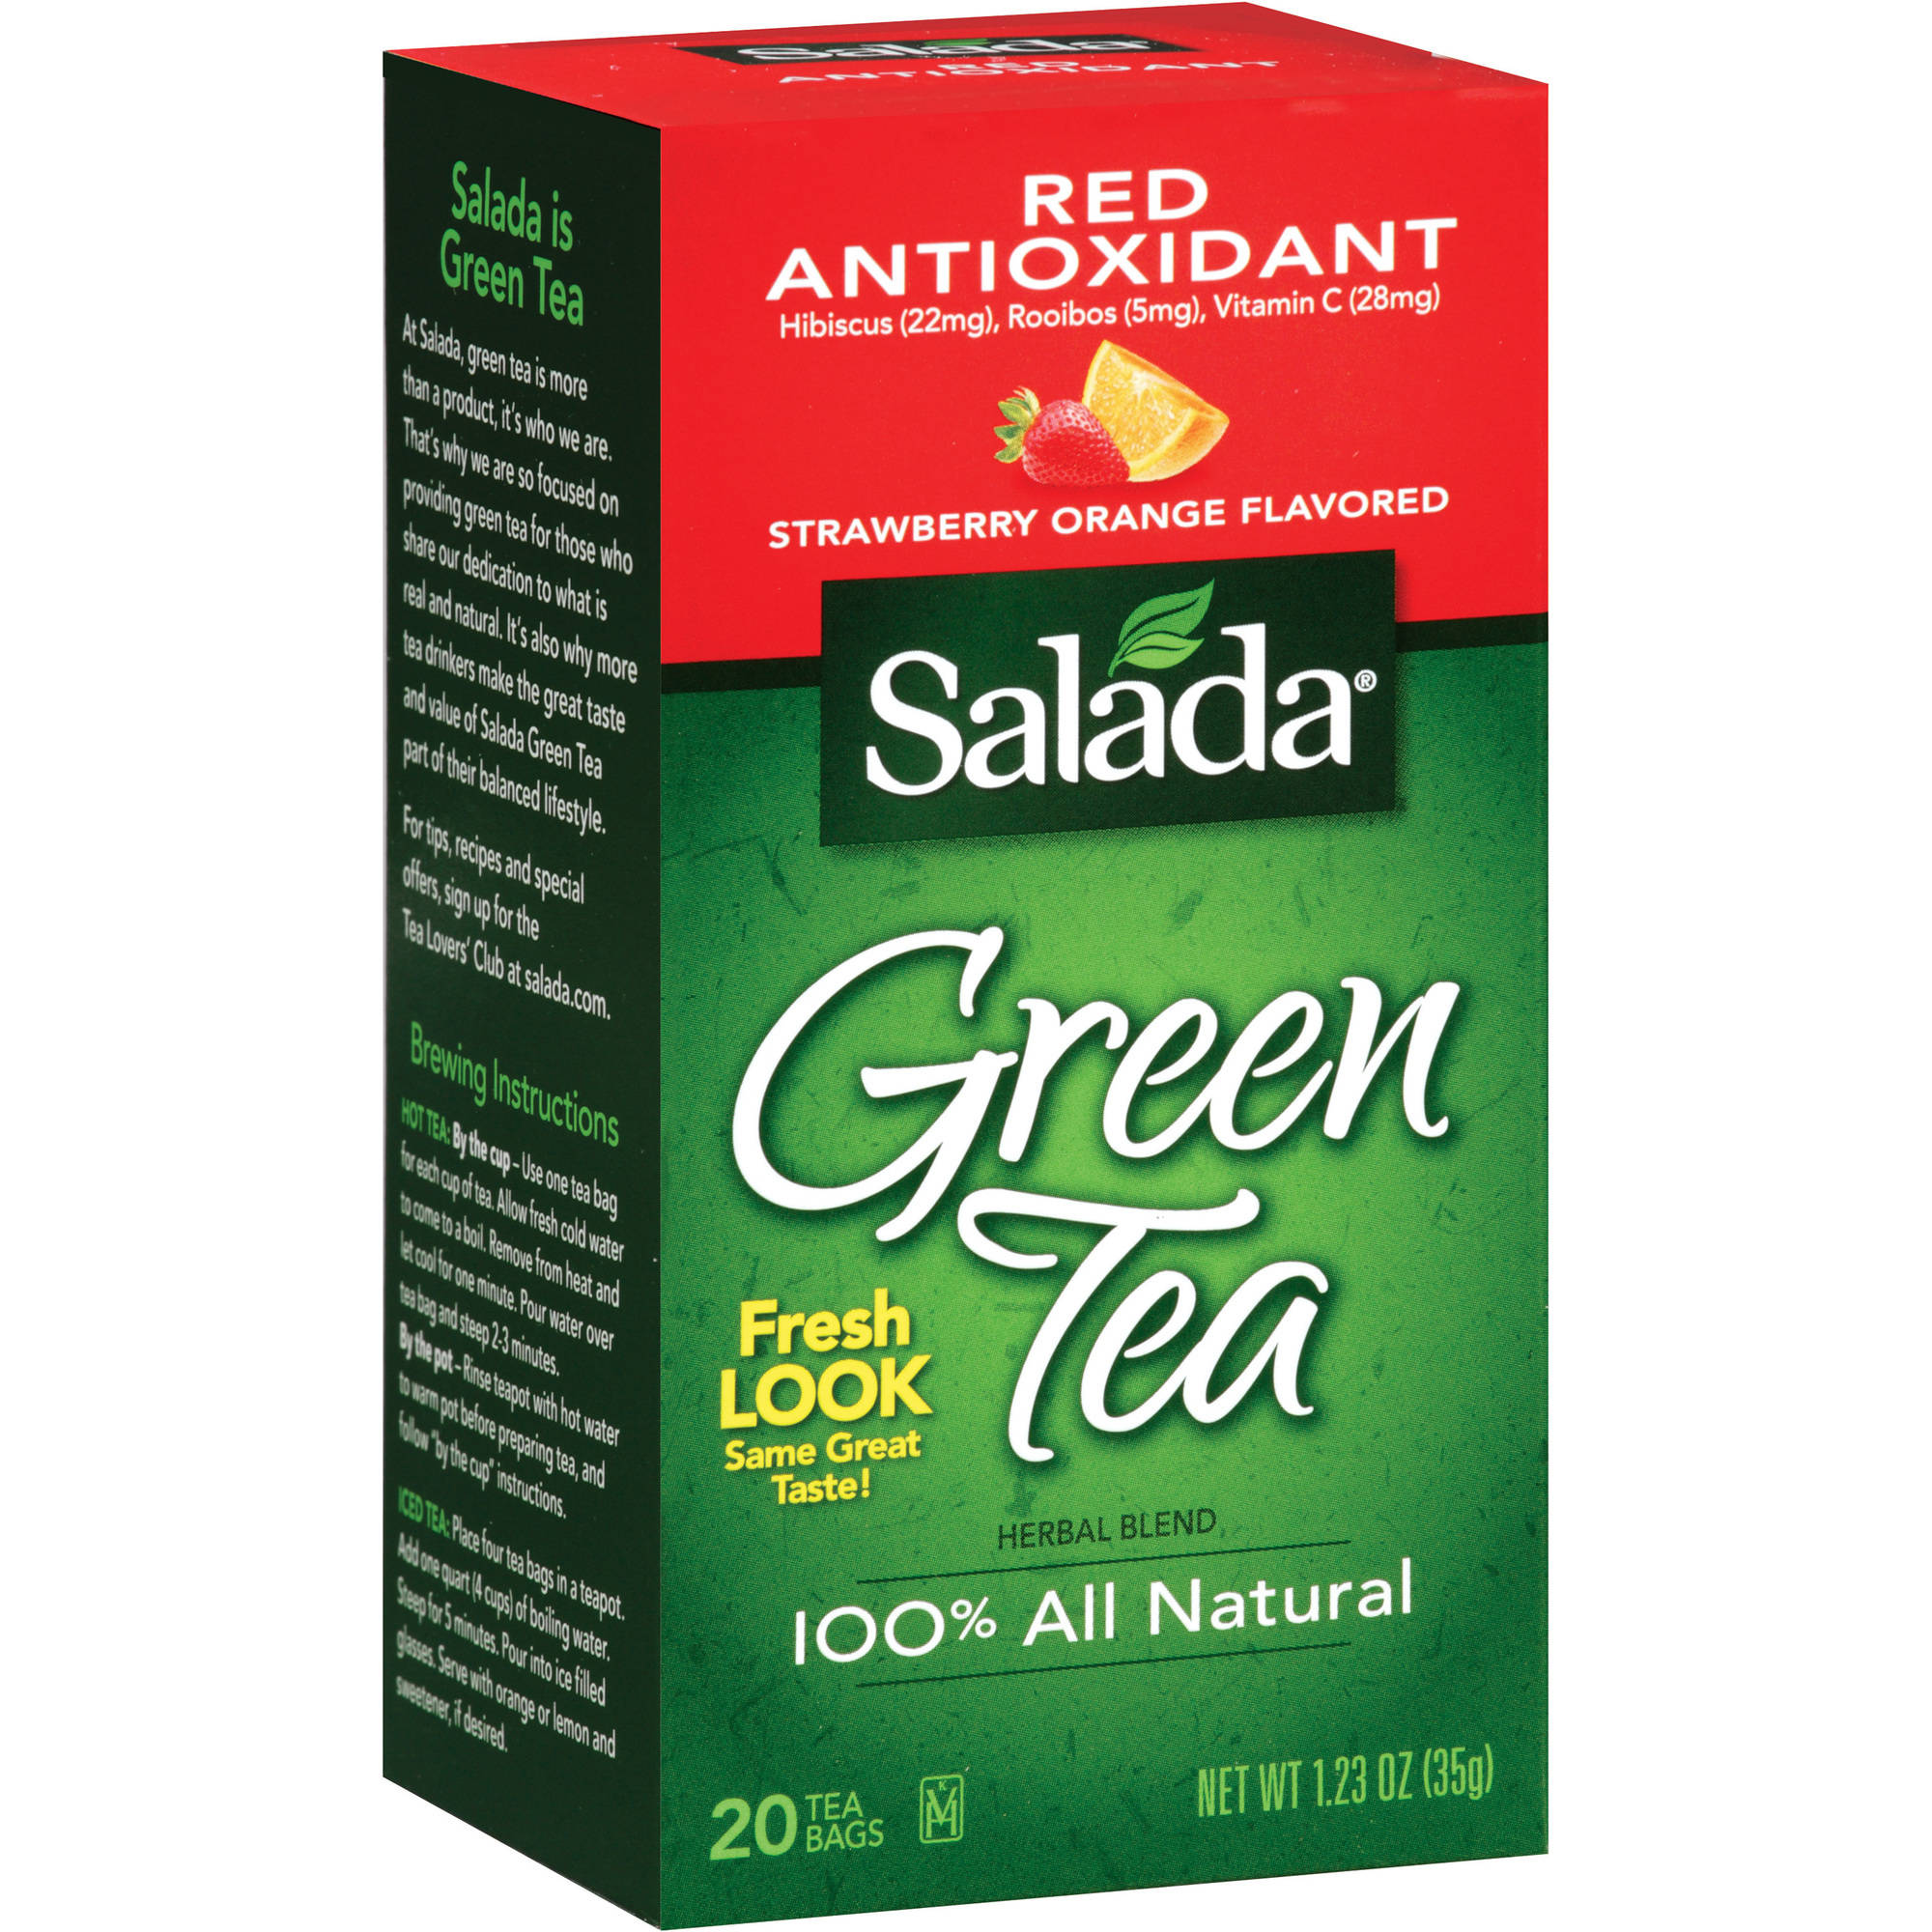 Salada Strawberry-Orange Green Tea With Red Antioxidants, 20ct (Pack of 6)